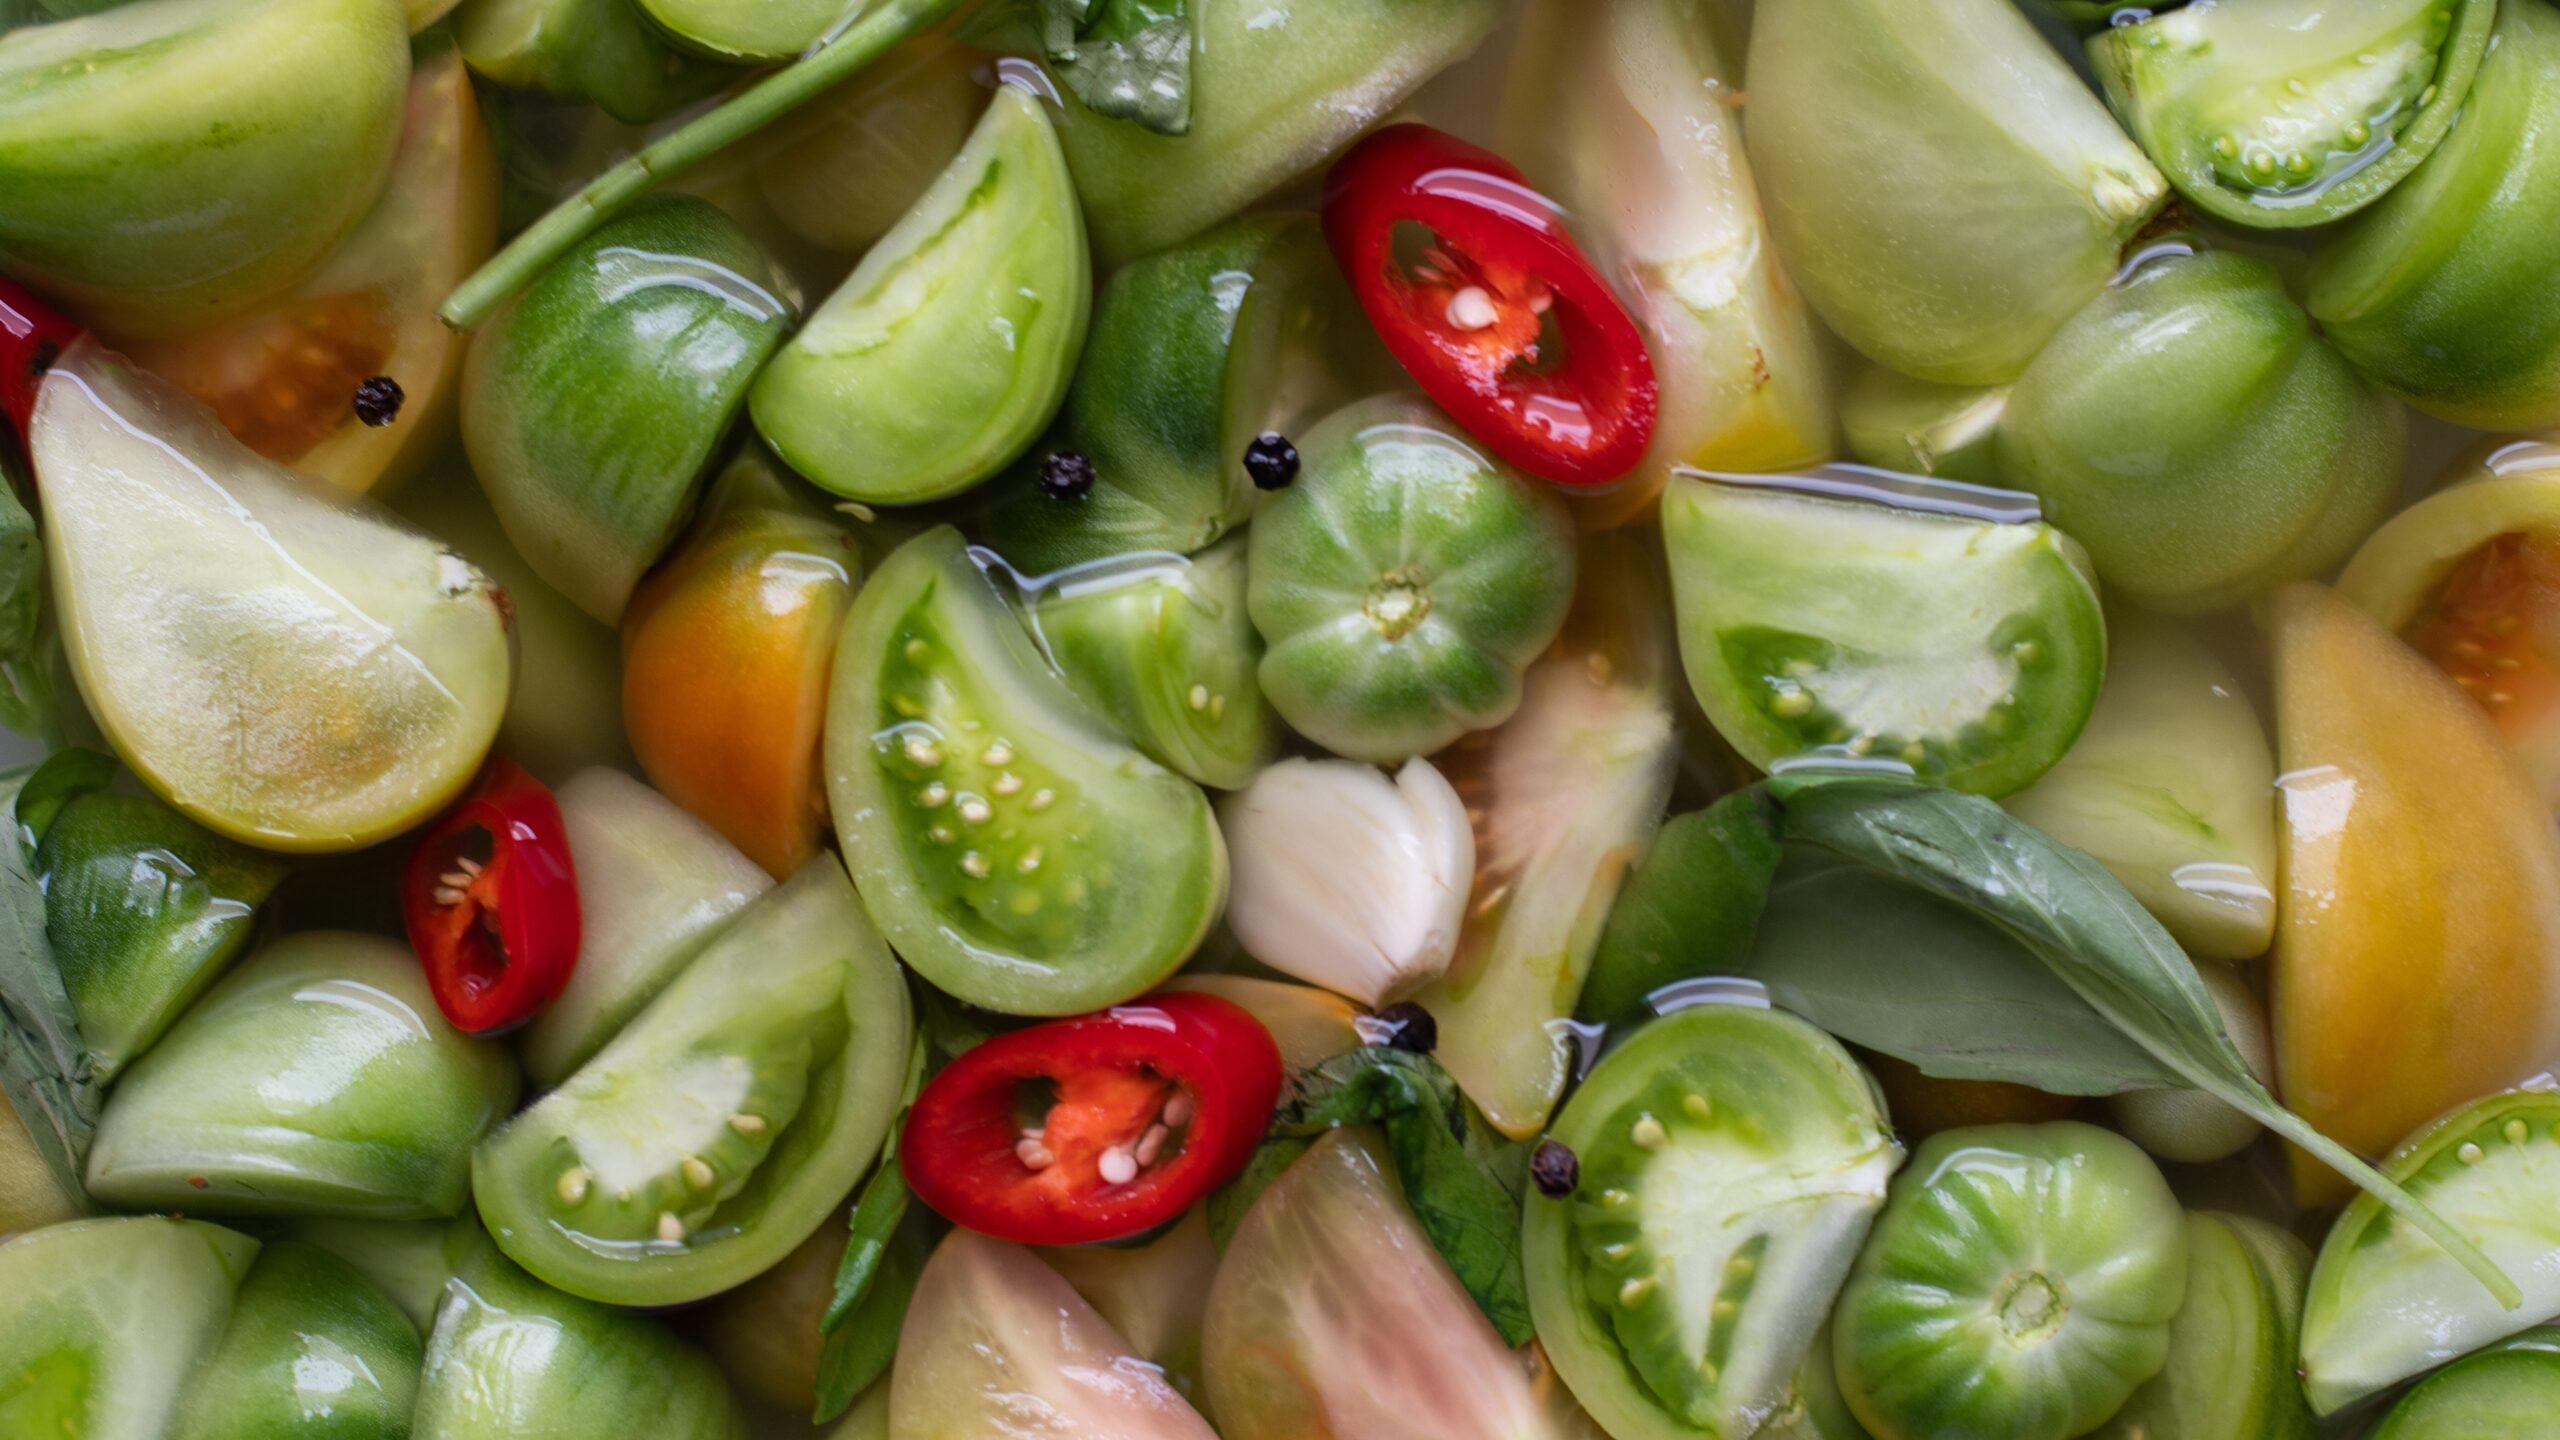 Tomatoes in Brine